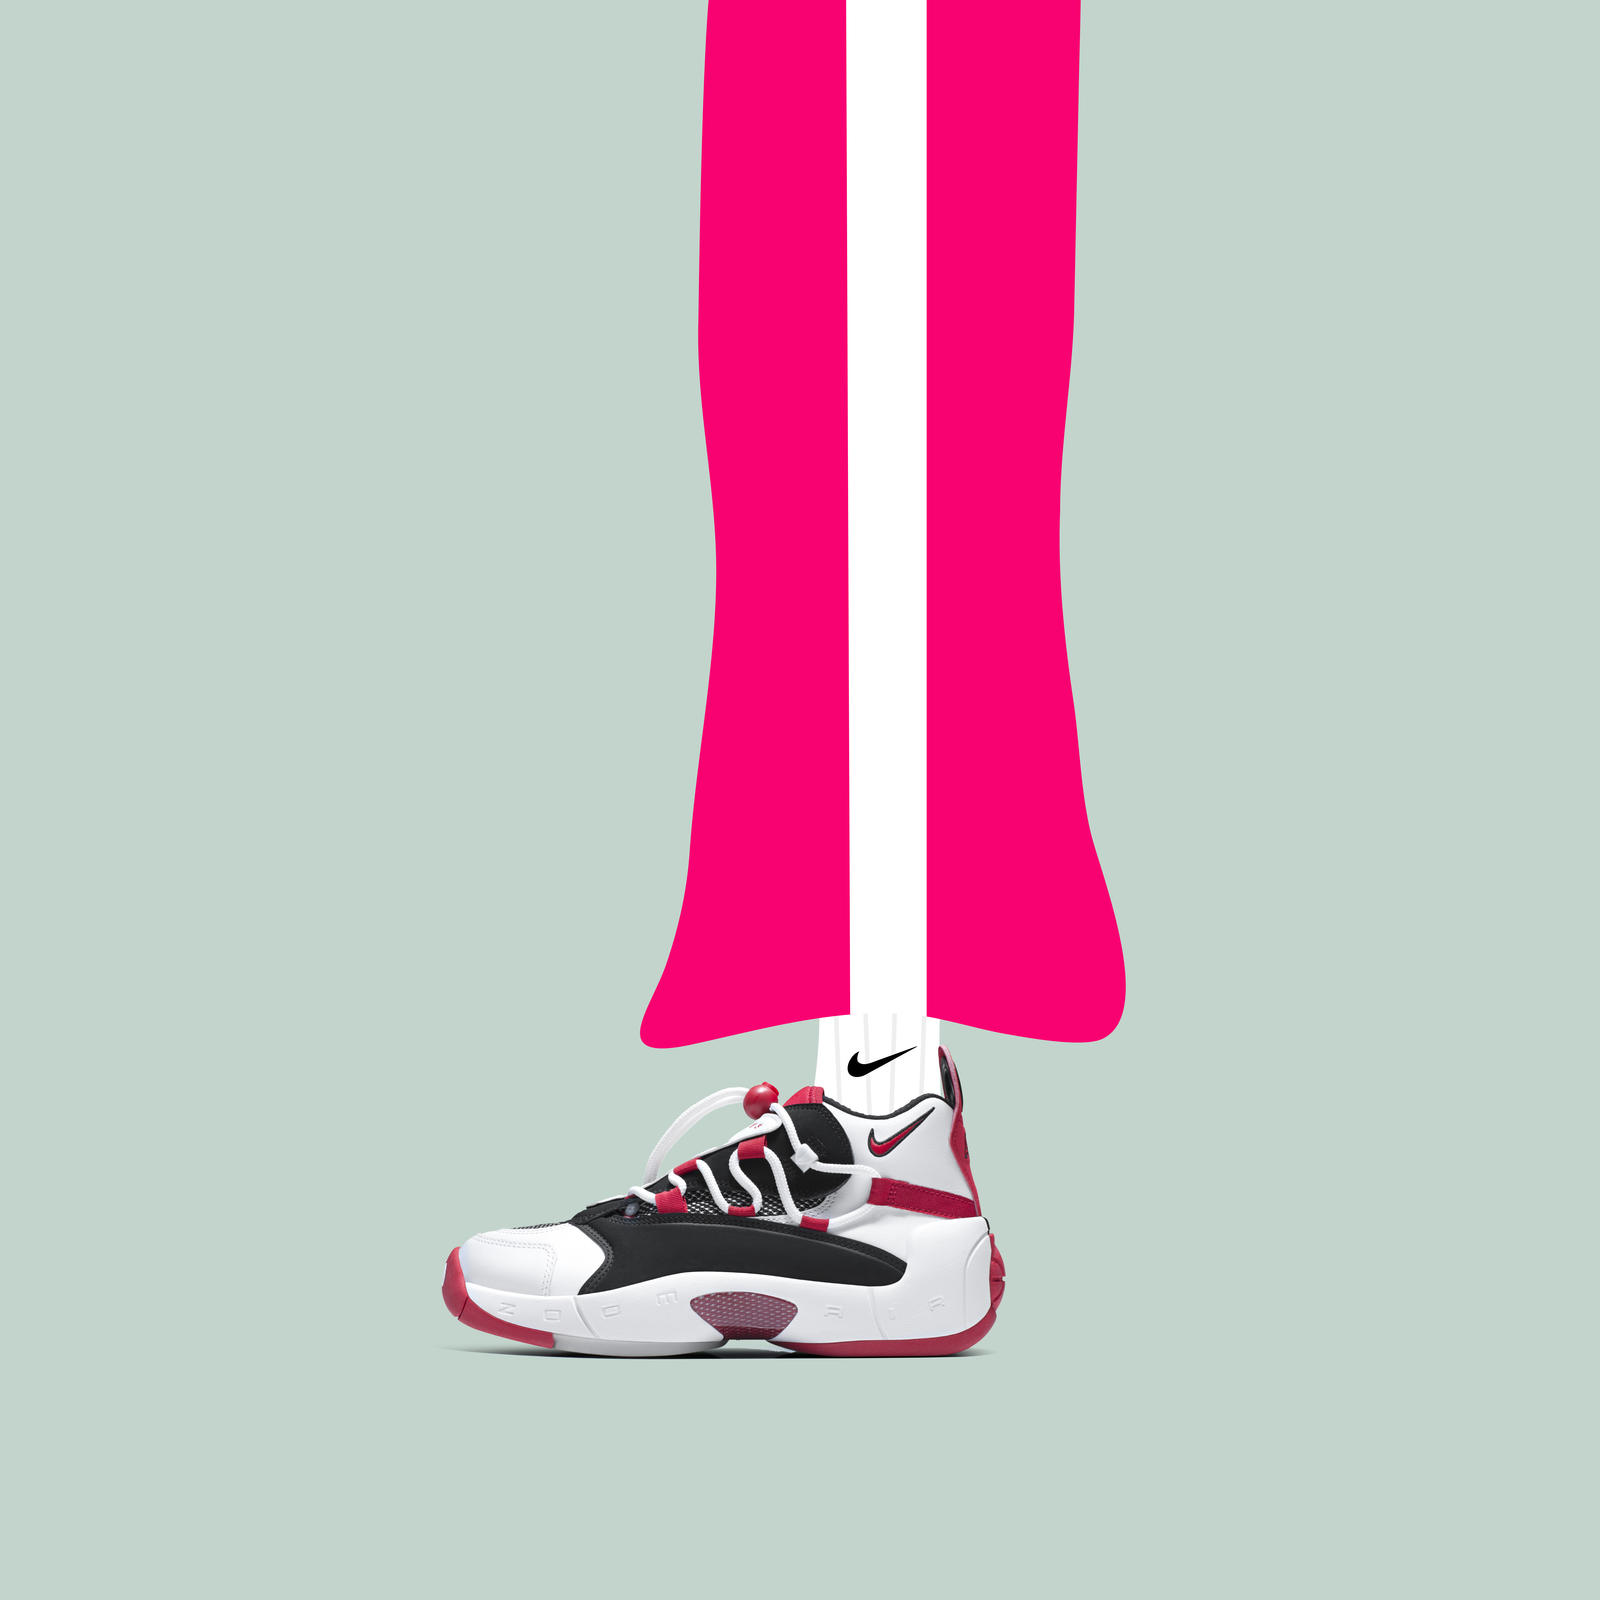 NikeSWOOPES2-01_81066.jpg